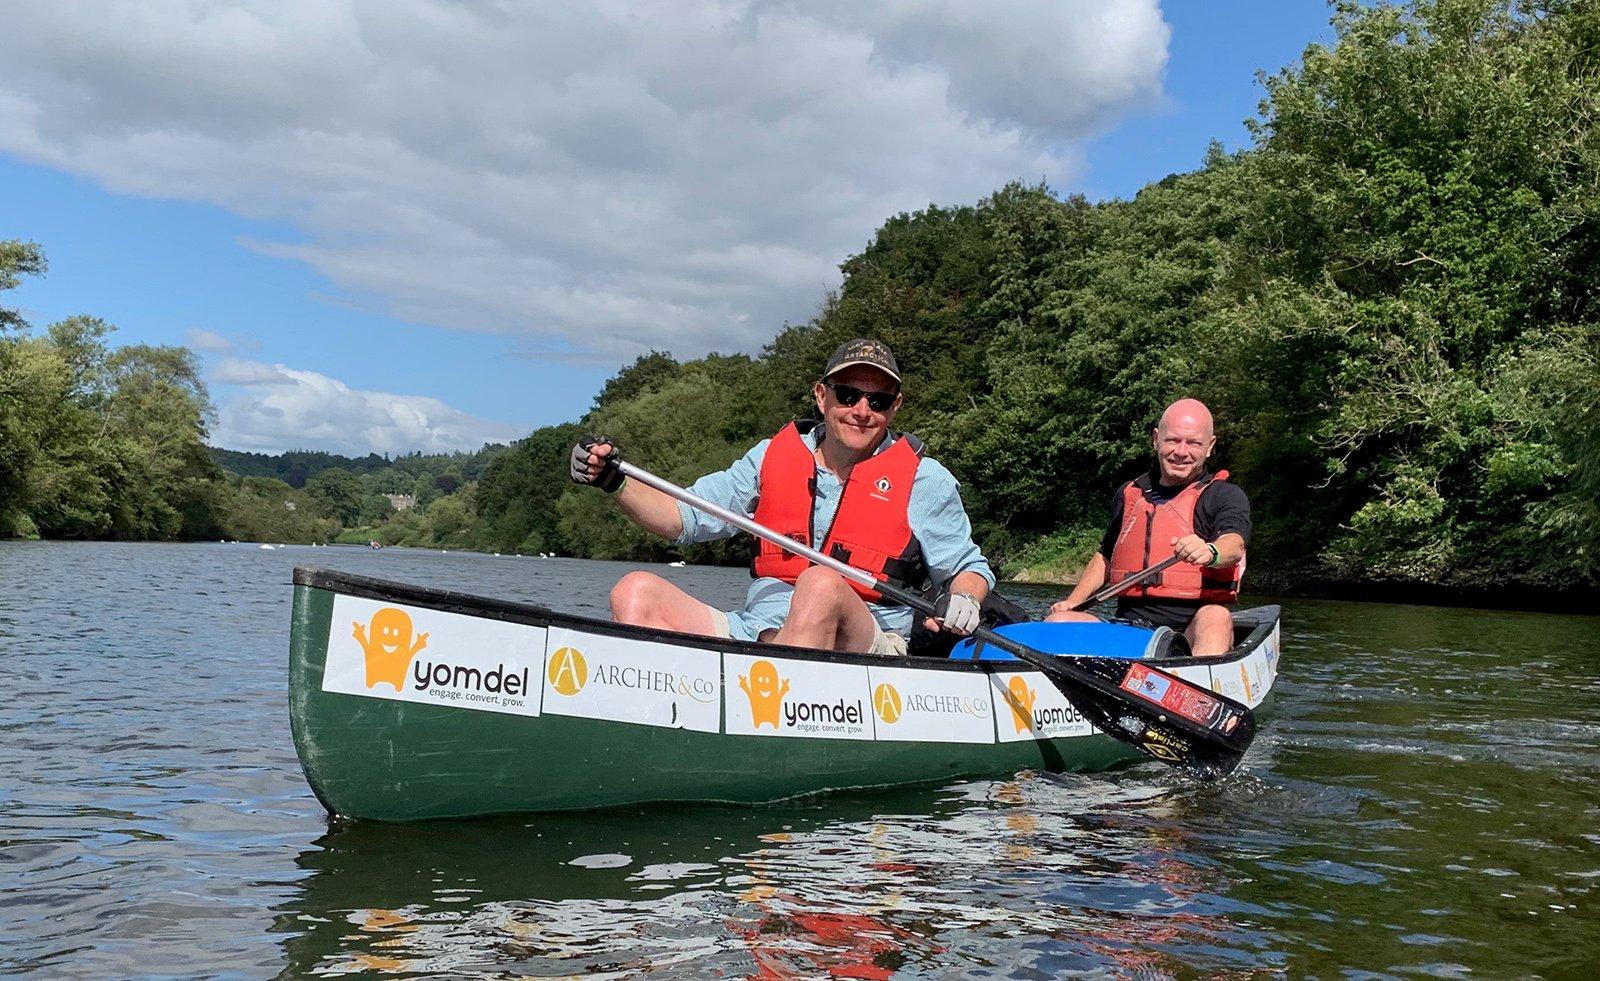 Andy Soloman & Iain McKenzie in the Yomdel canoe